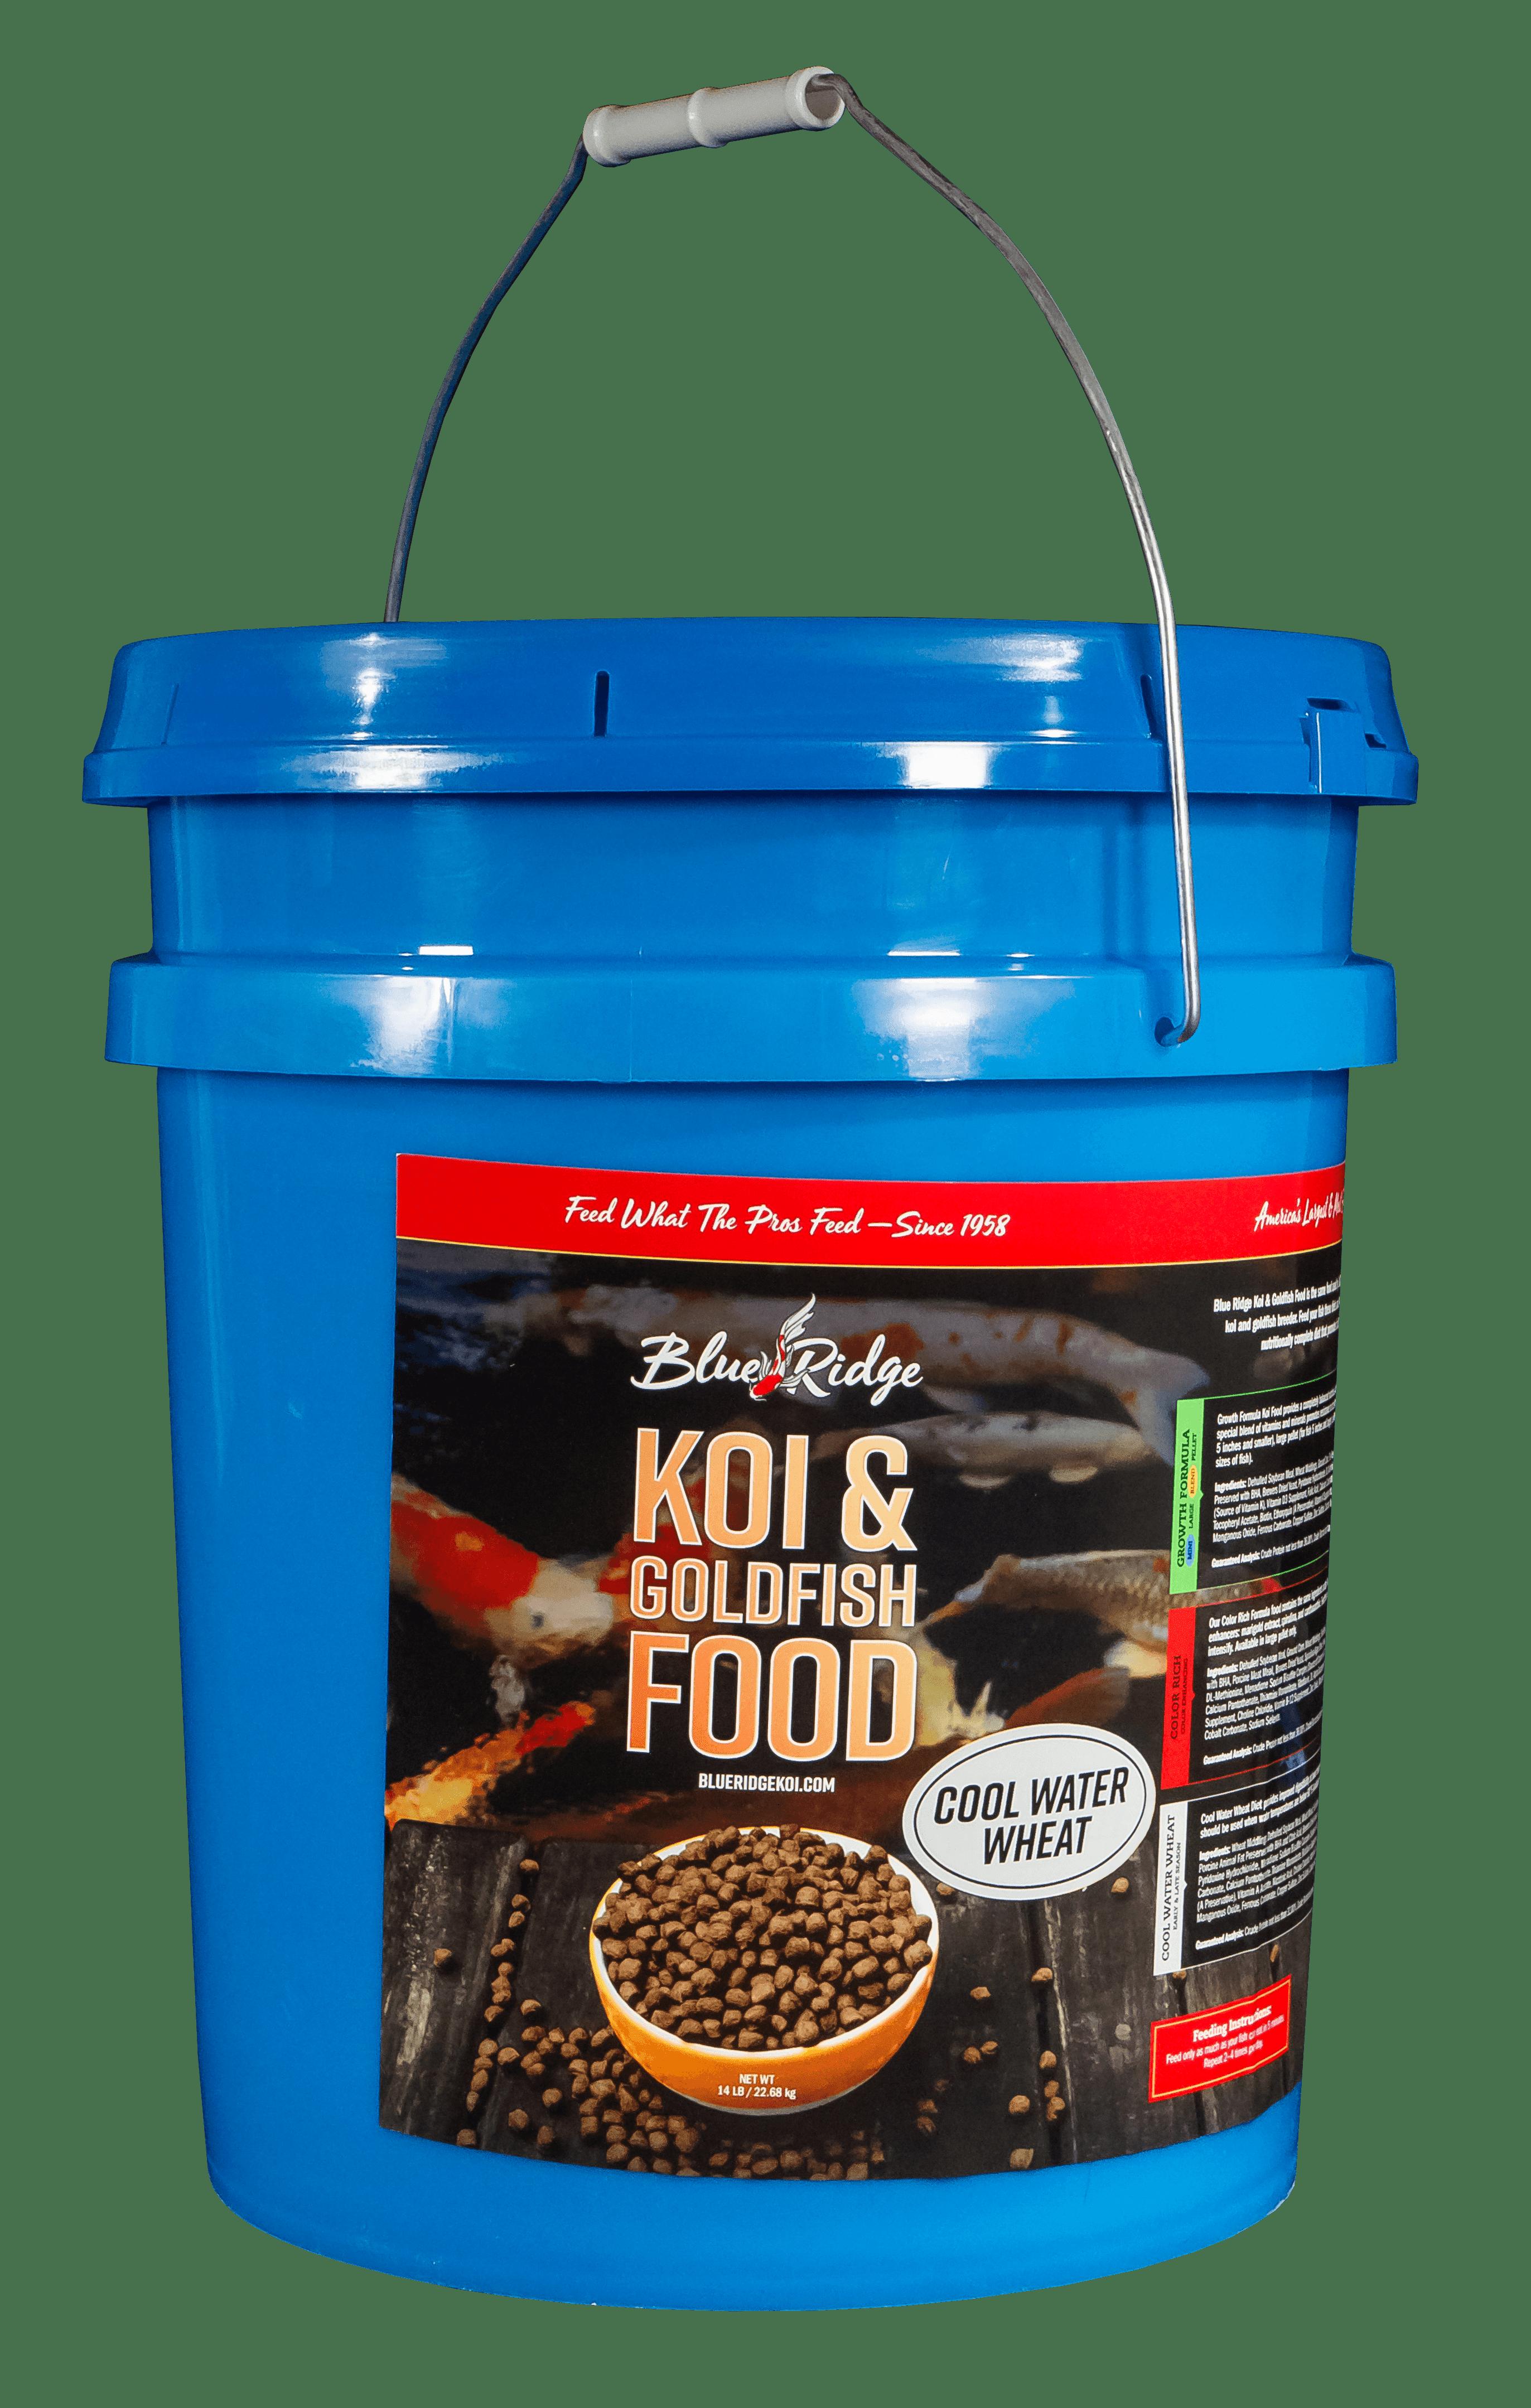 Blue Ridge Cool Water Wheat Formula Koi & Goldfish Fish Food Pellets, 14 lb by Blue Ridge Koi & Goldfish